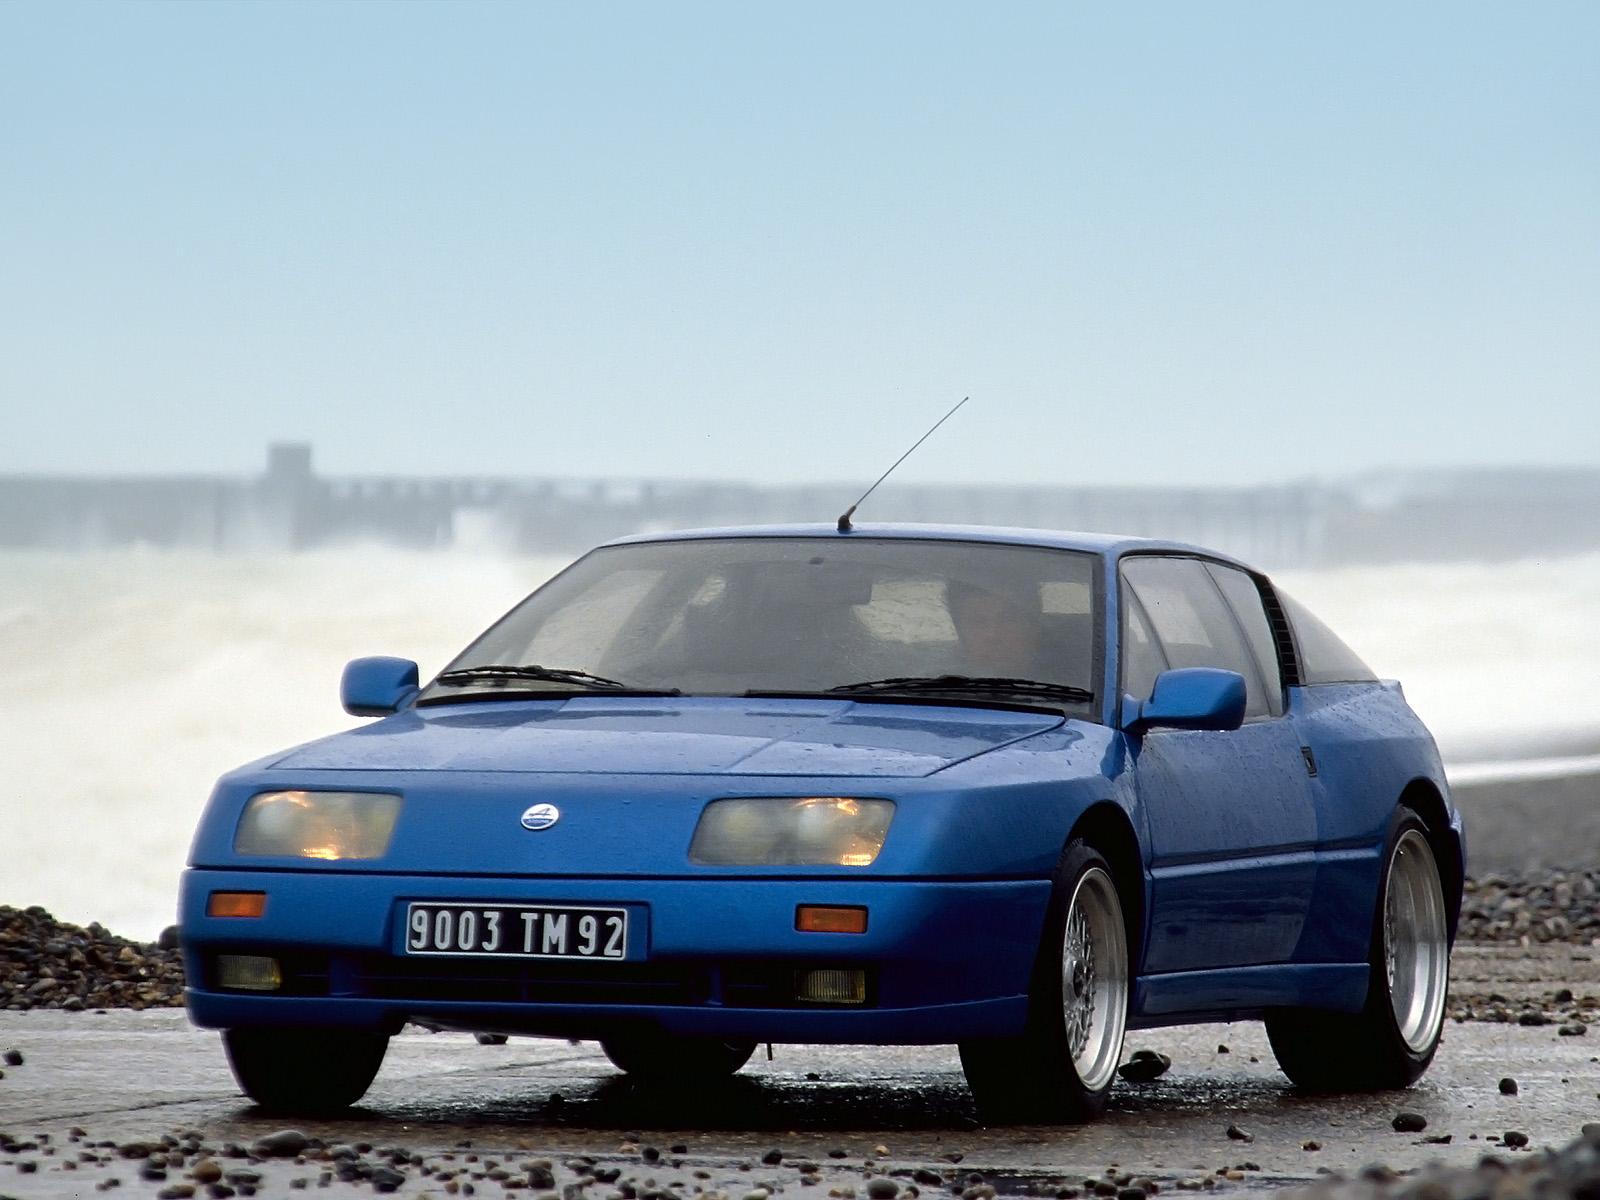 Despite its official designation, the GT2 car was still based on the older GTA.